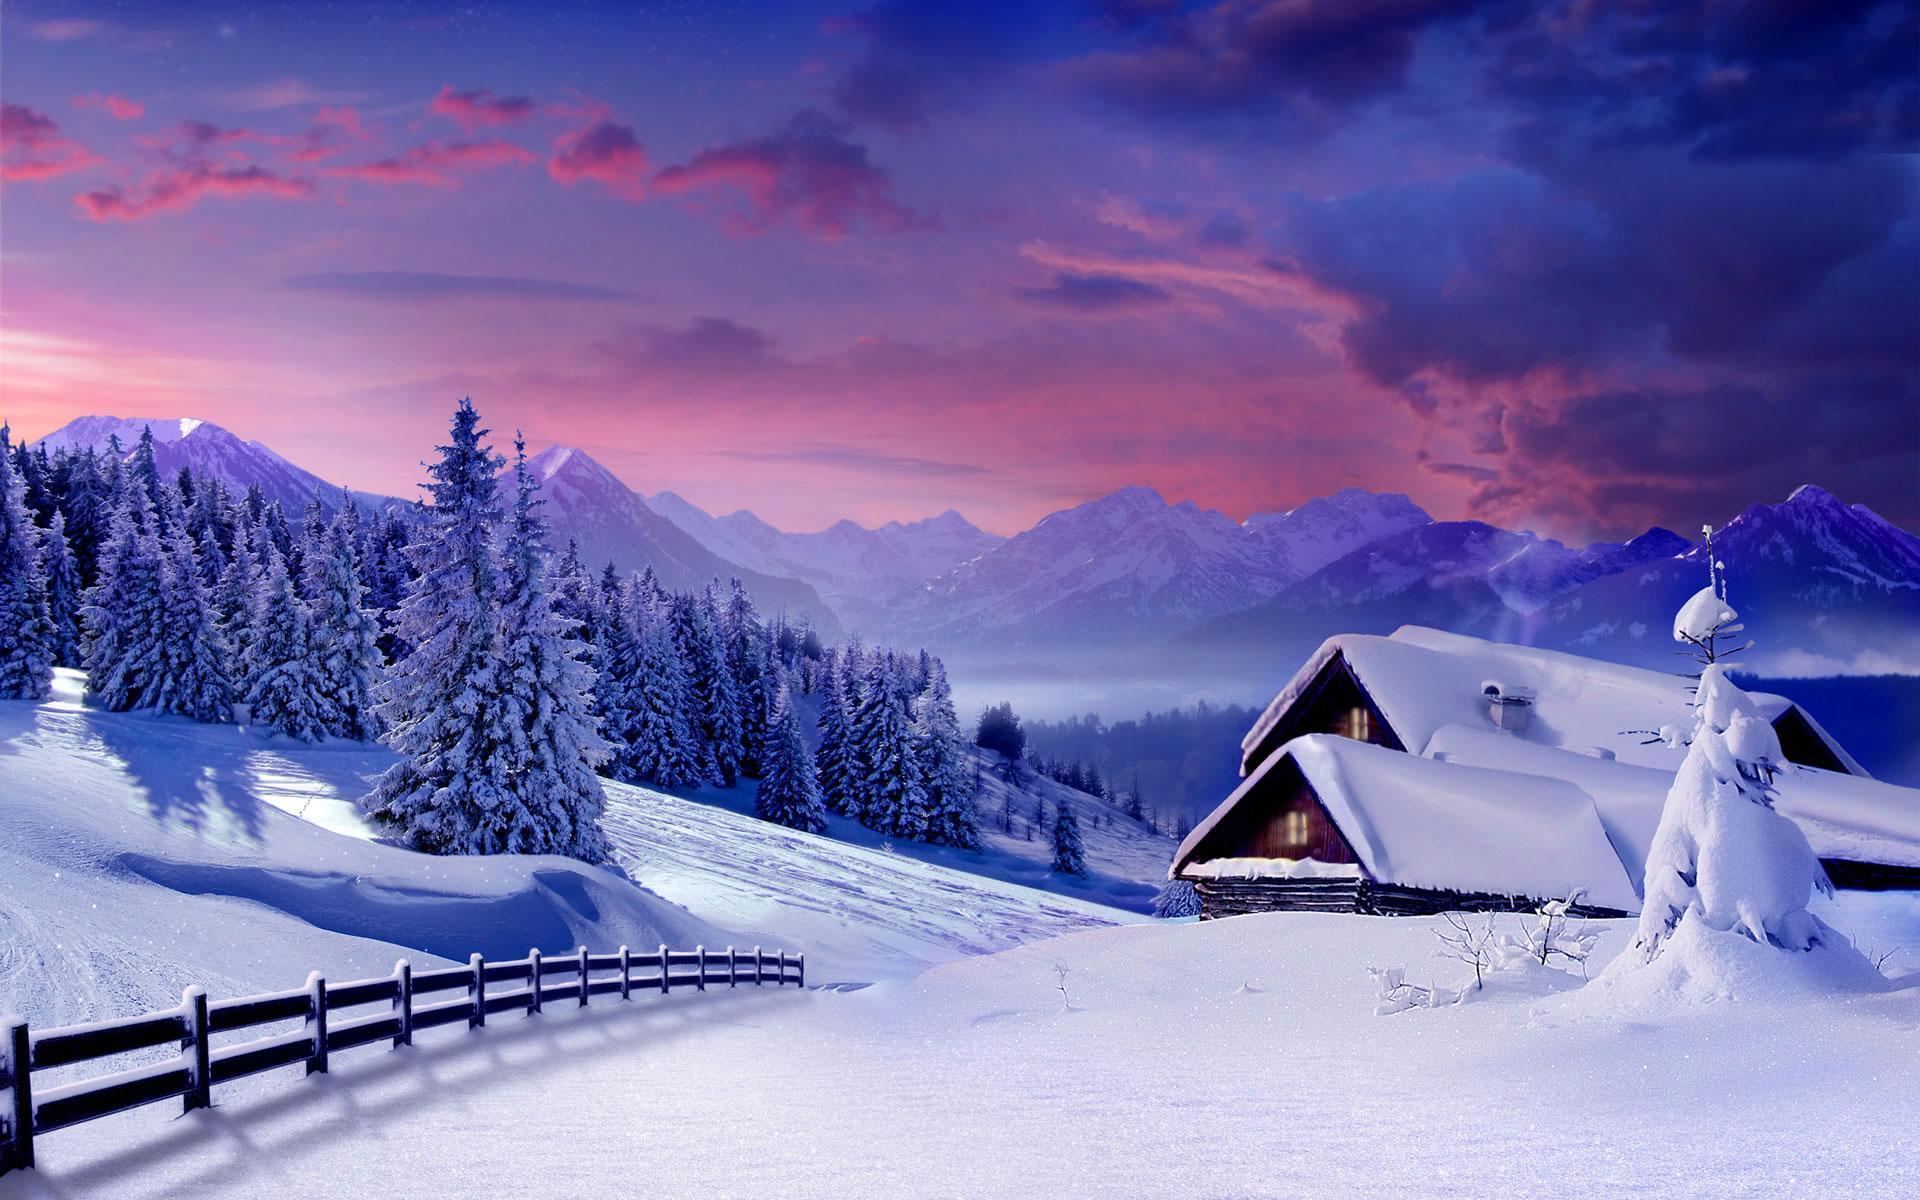 Зима снег пушистый обои